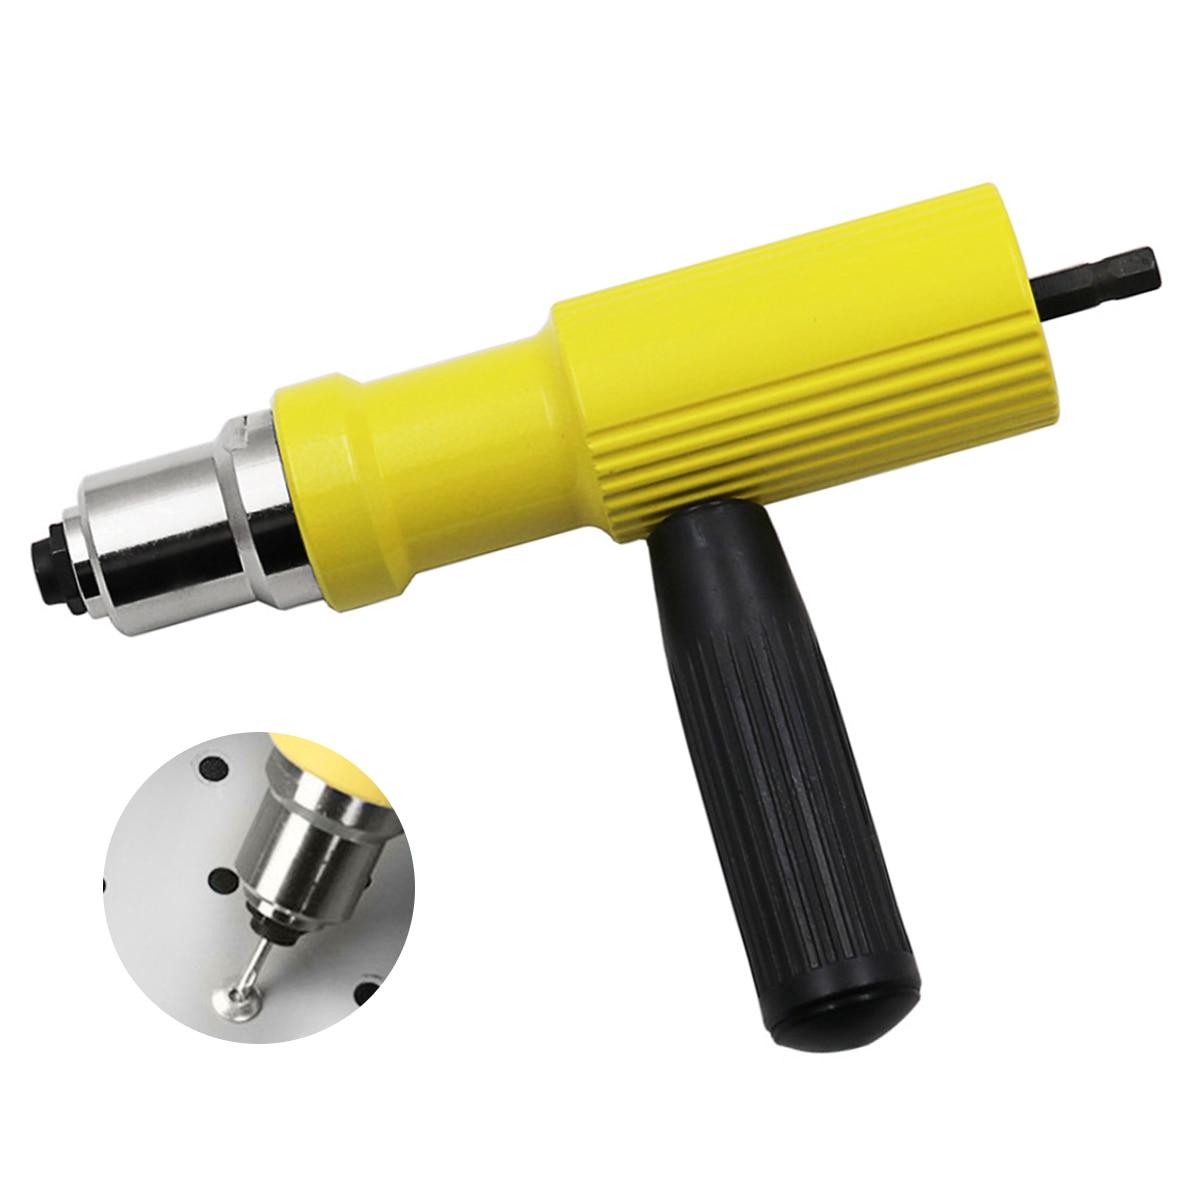 Electric Rivet Nut Gun Riveting Tool Cordless Riveting Drill Adapter Insert Nut Tool